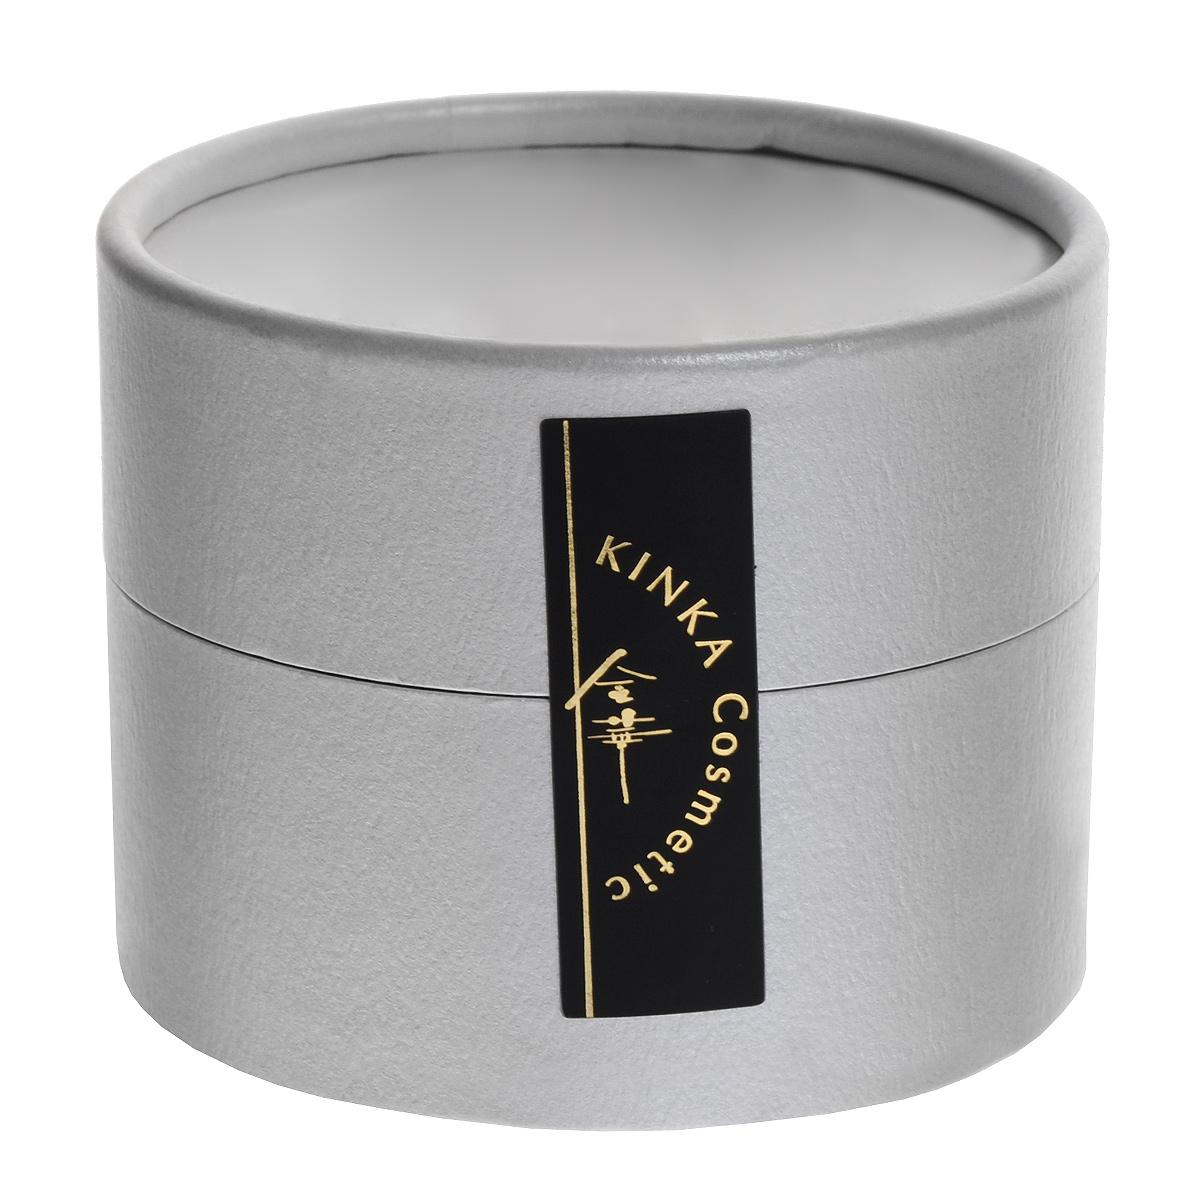 Kinka Крем для лица Gold Nano Kapsular EX, с наноколоидами платины и золота, в капсулах, 50 г (Hakuichi)